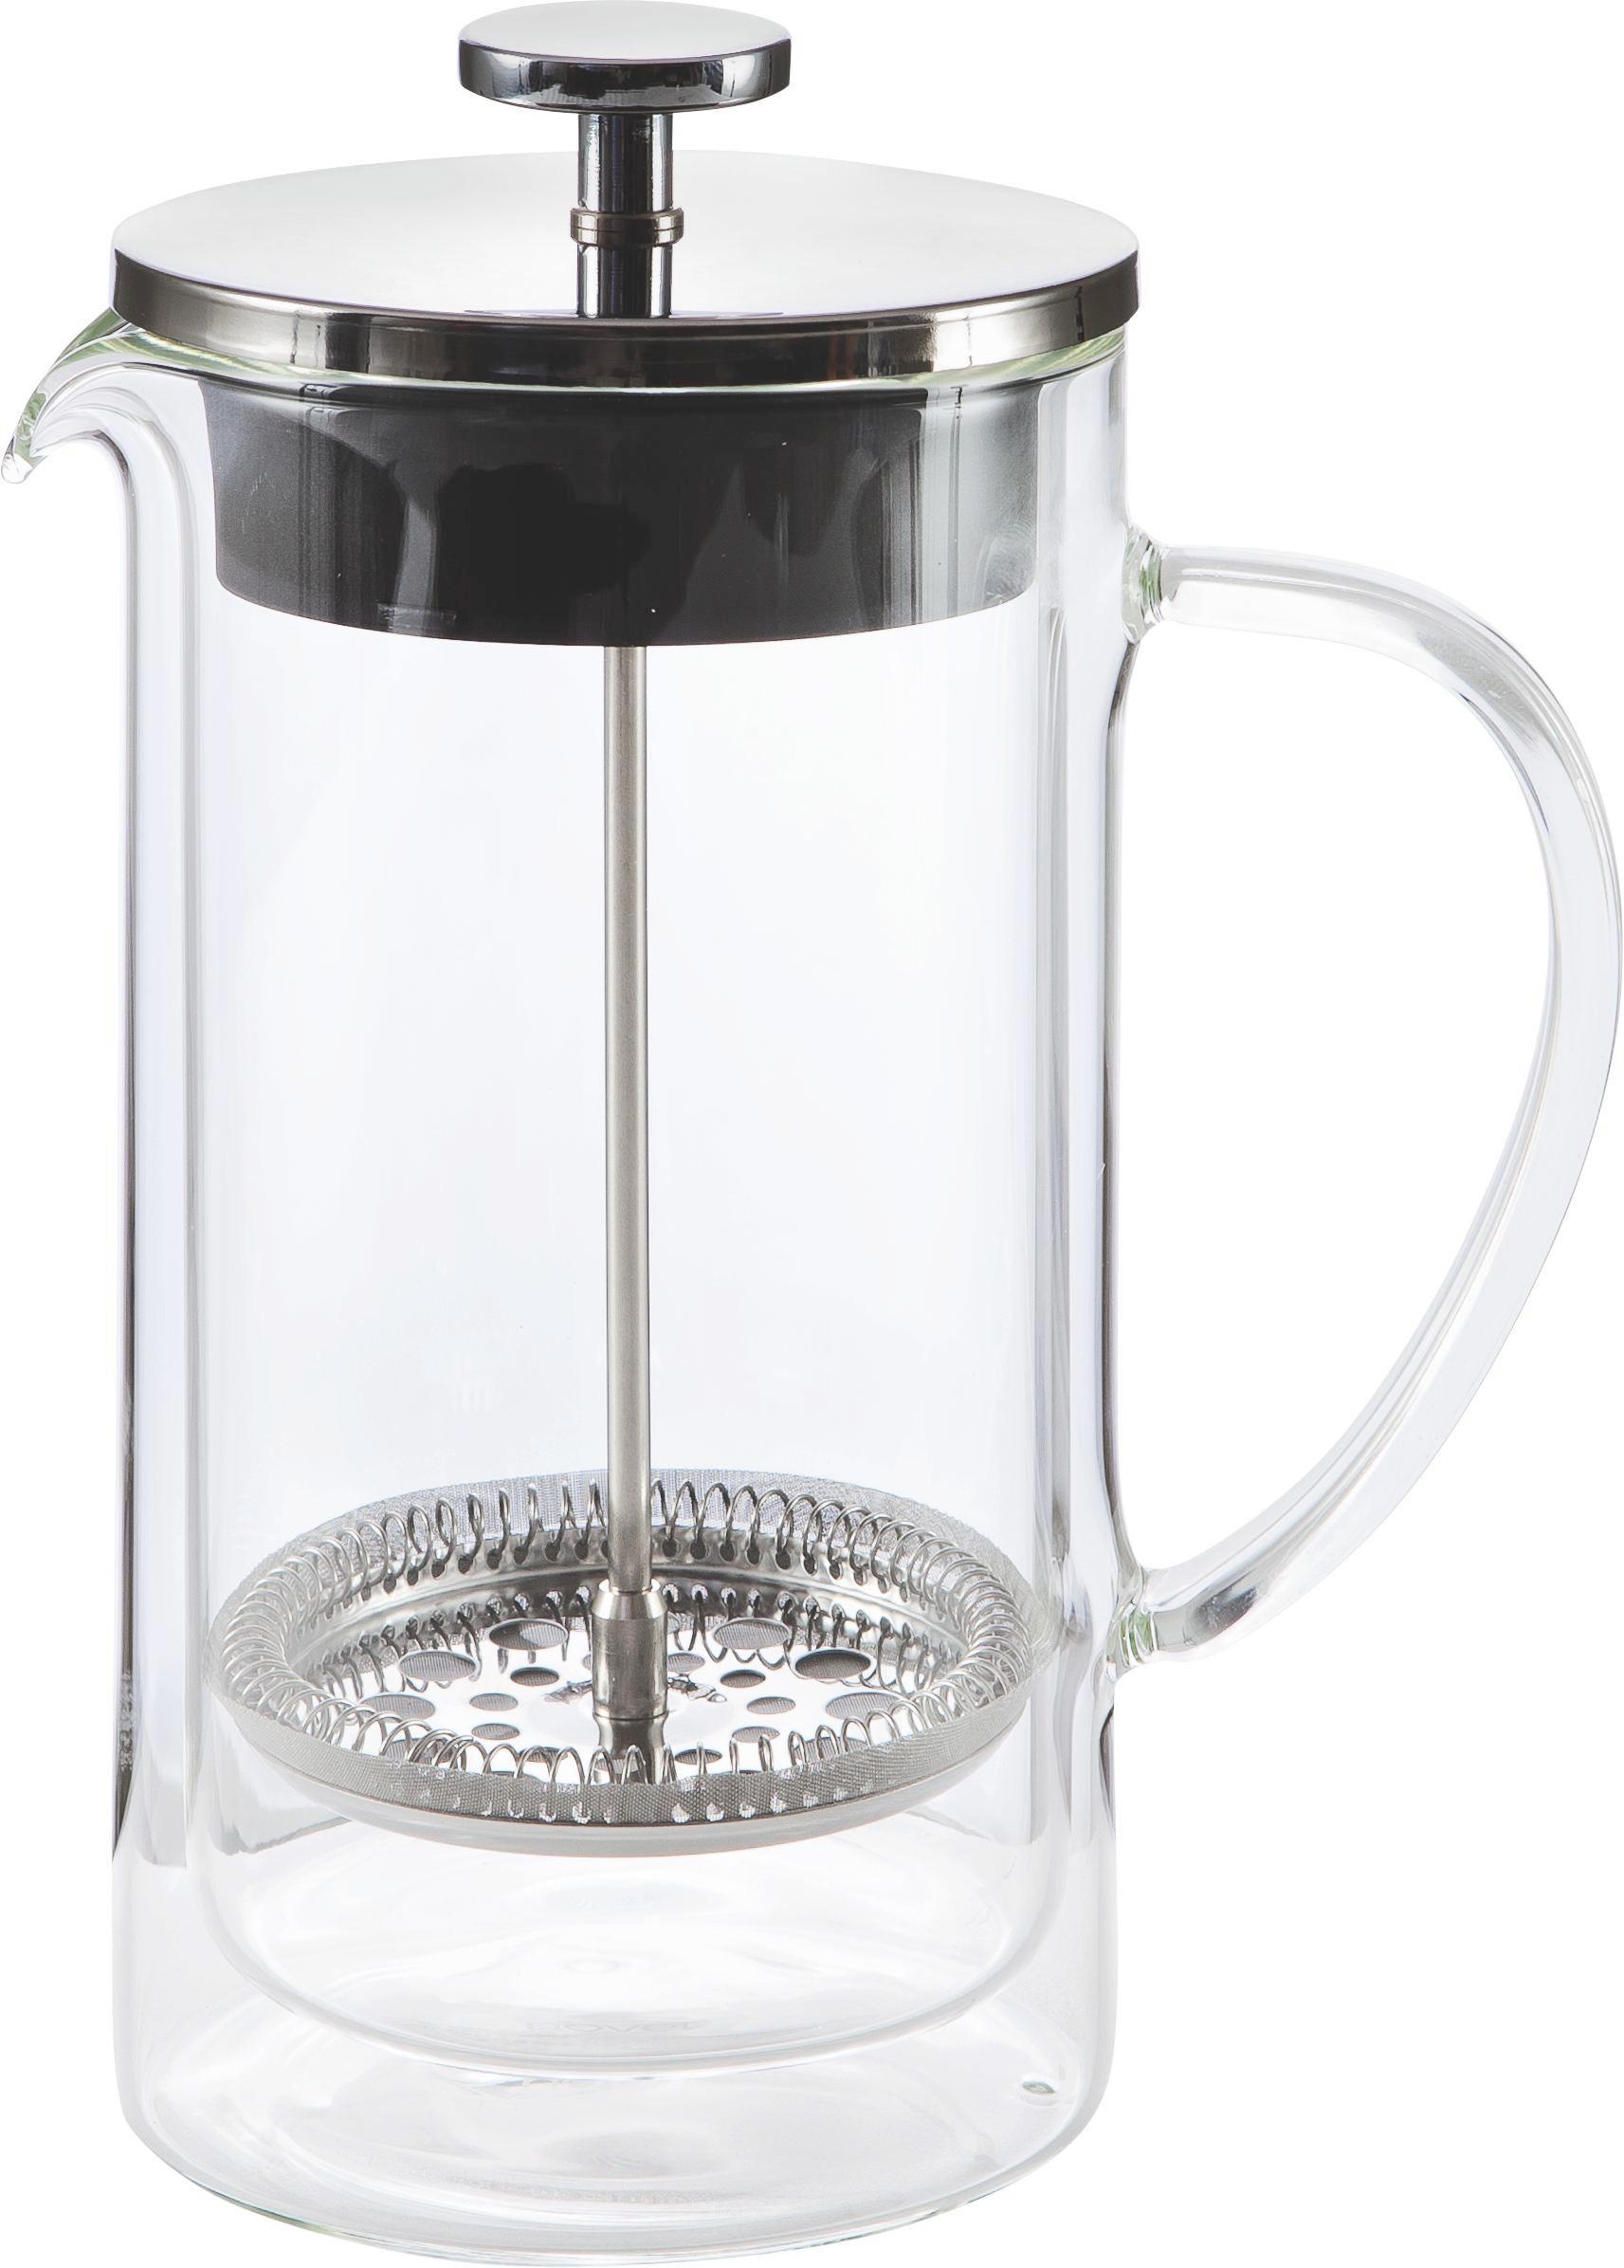 KAFFEEBEREITER - Klar/Silberfarben, Basics, Glas/Kunststoff (10,6/22cm) - NOVEL